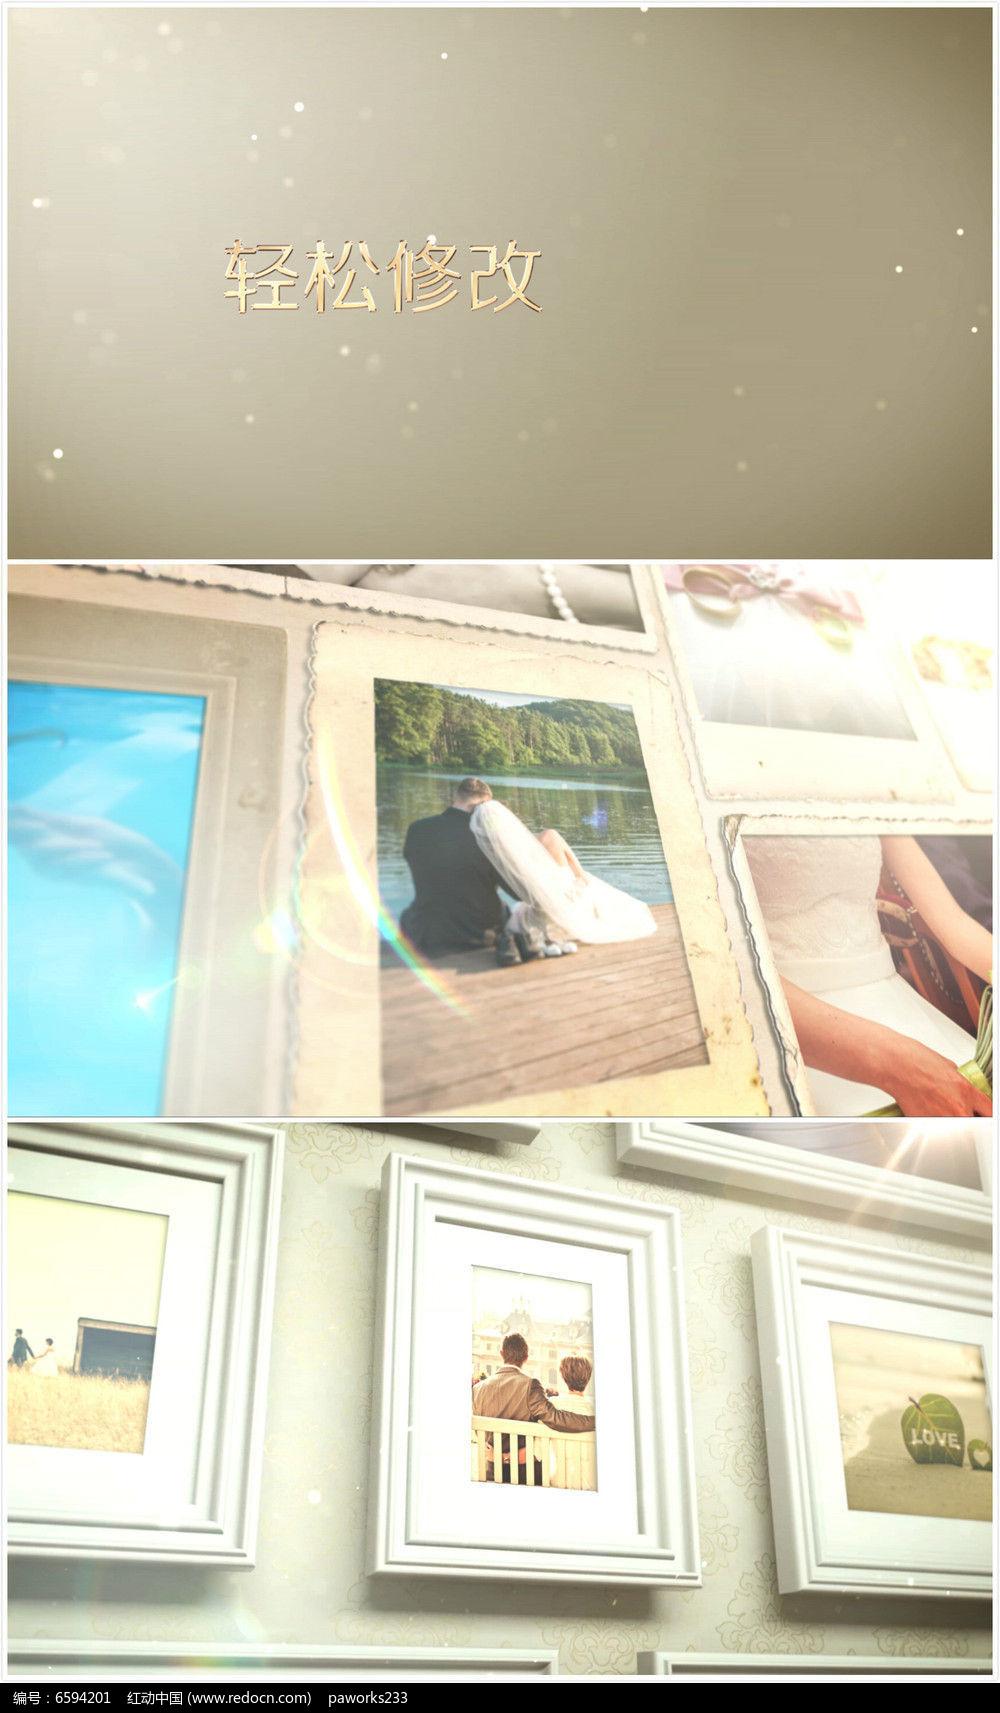 3d典雅立体爱情相框展示ae模板图片